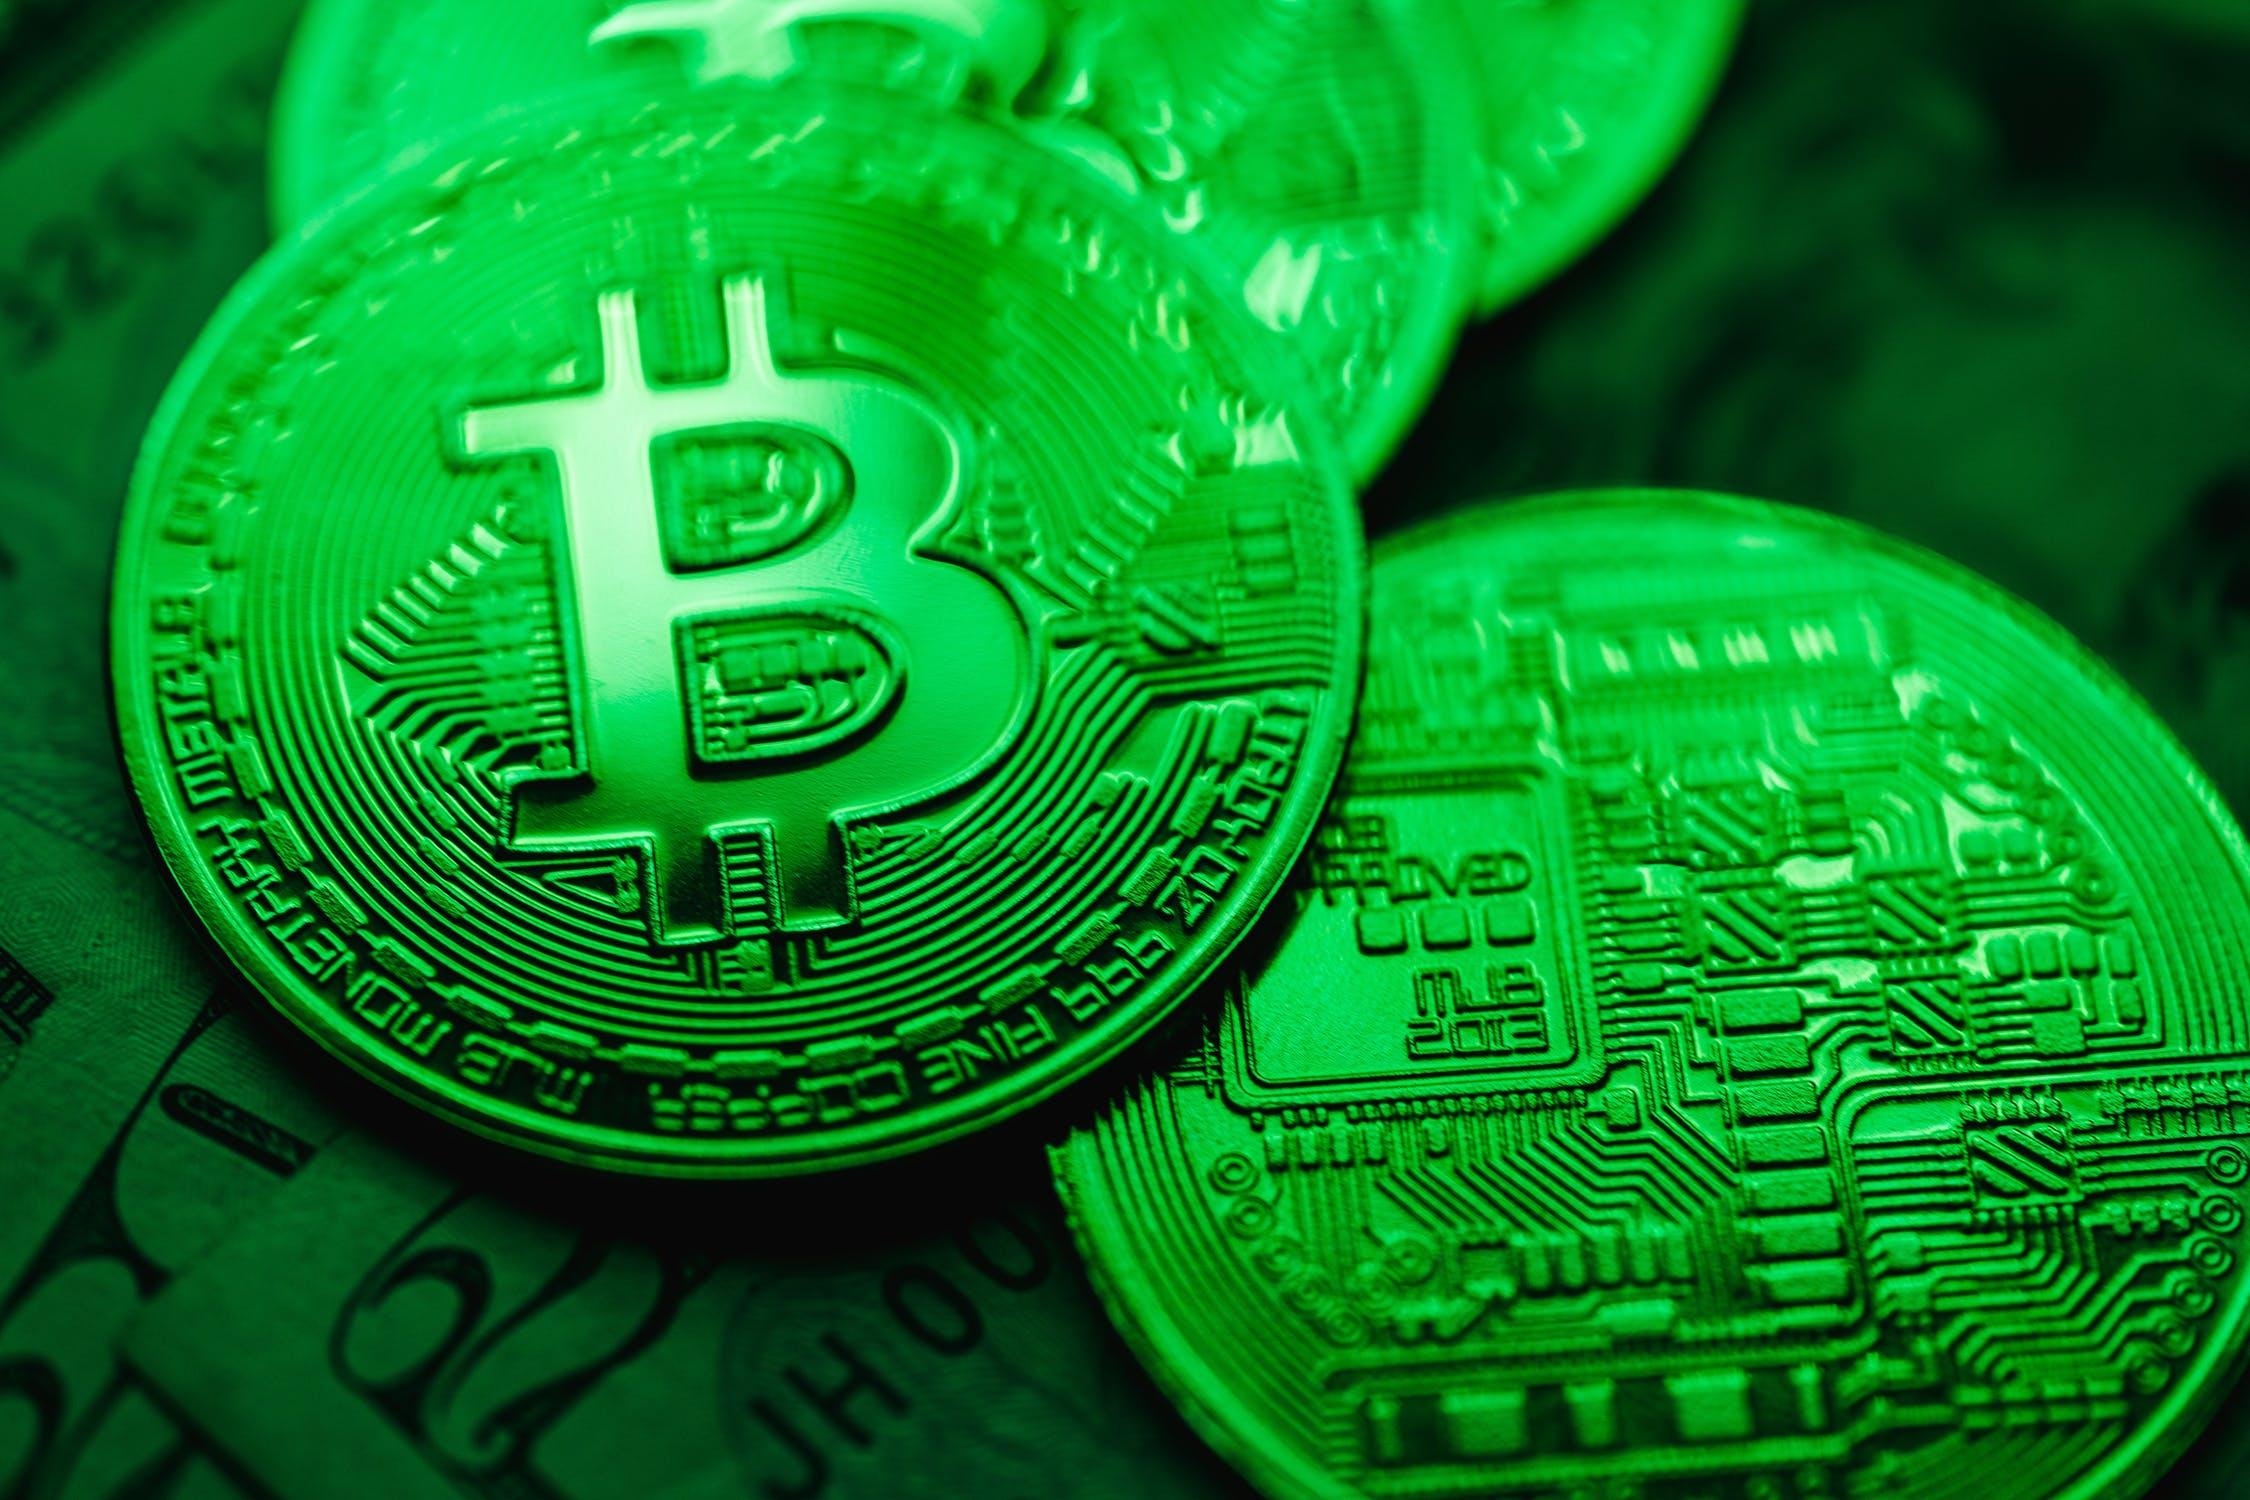 kasyna Bitcoin